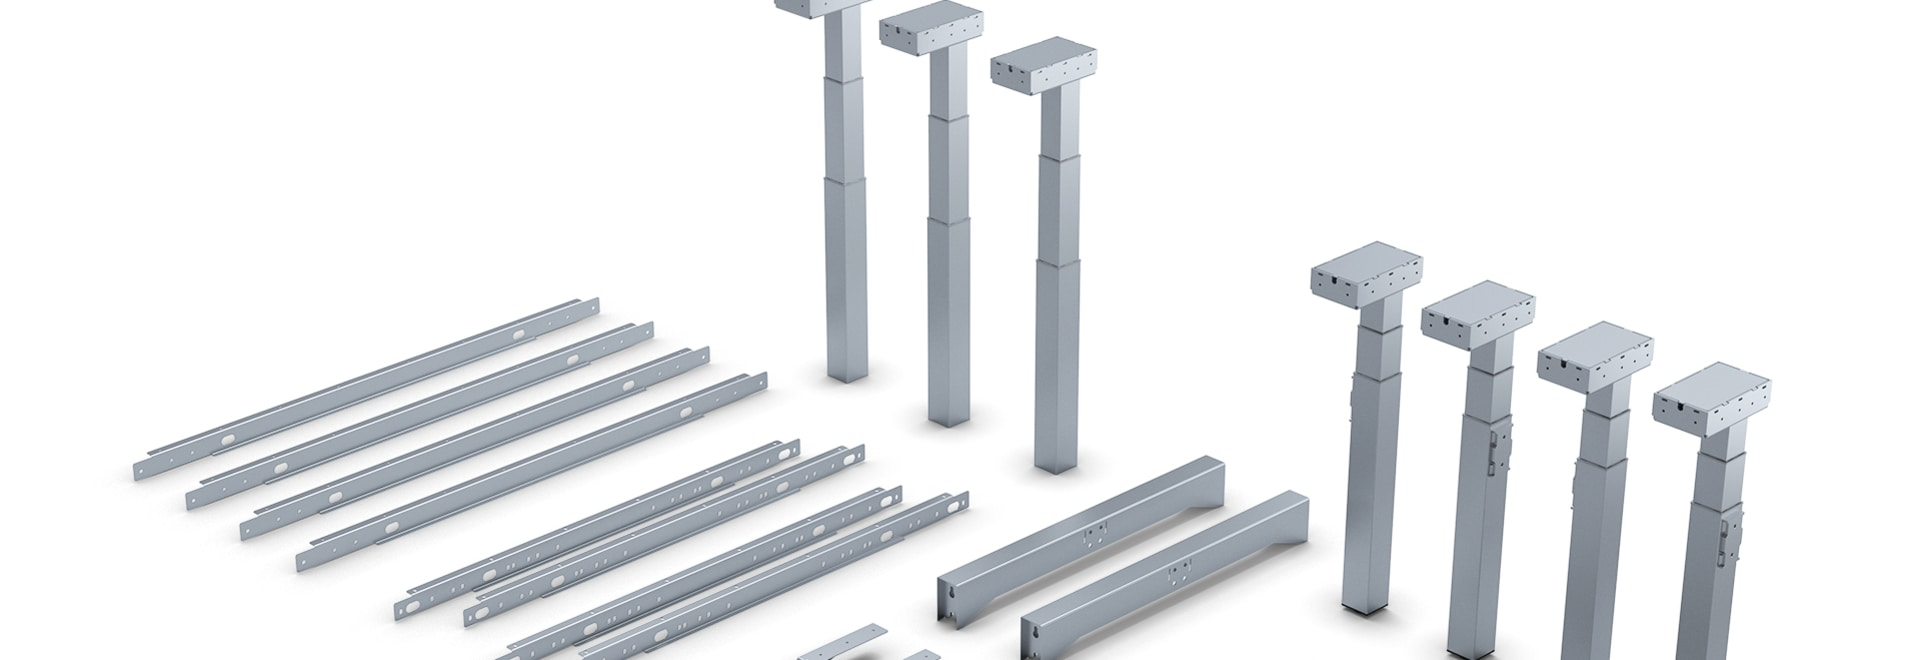 Sistema modulare per diversi sottotelai di tavoli